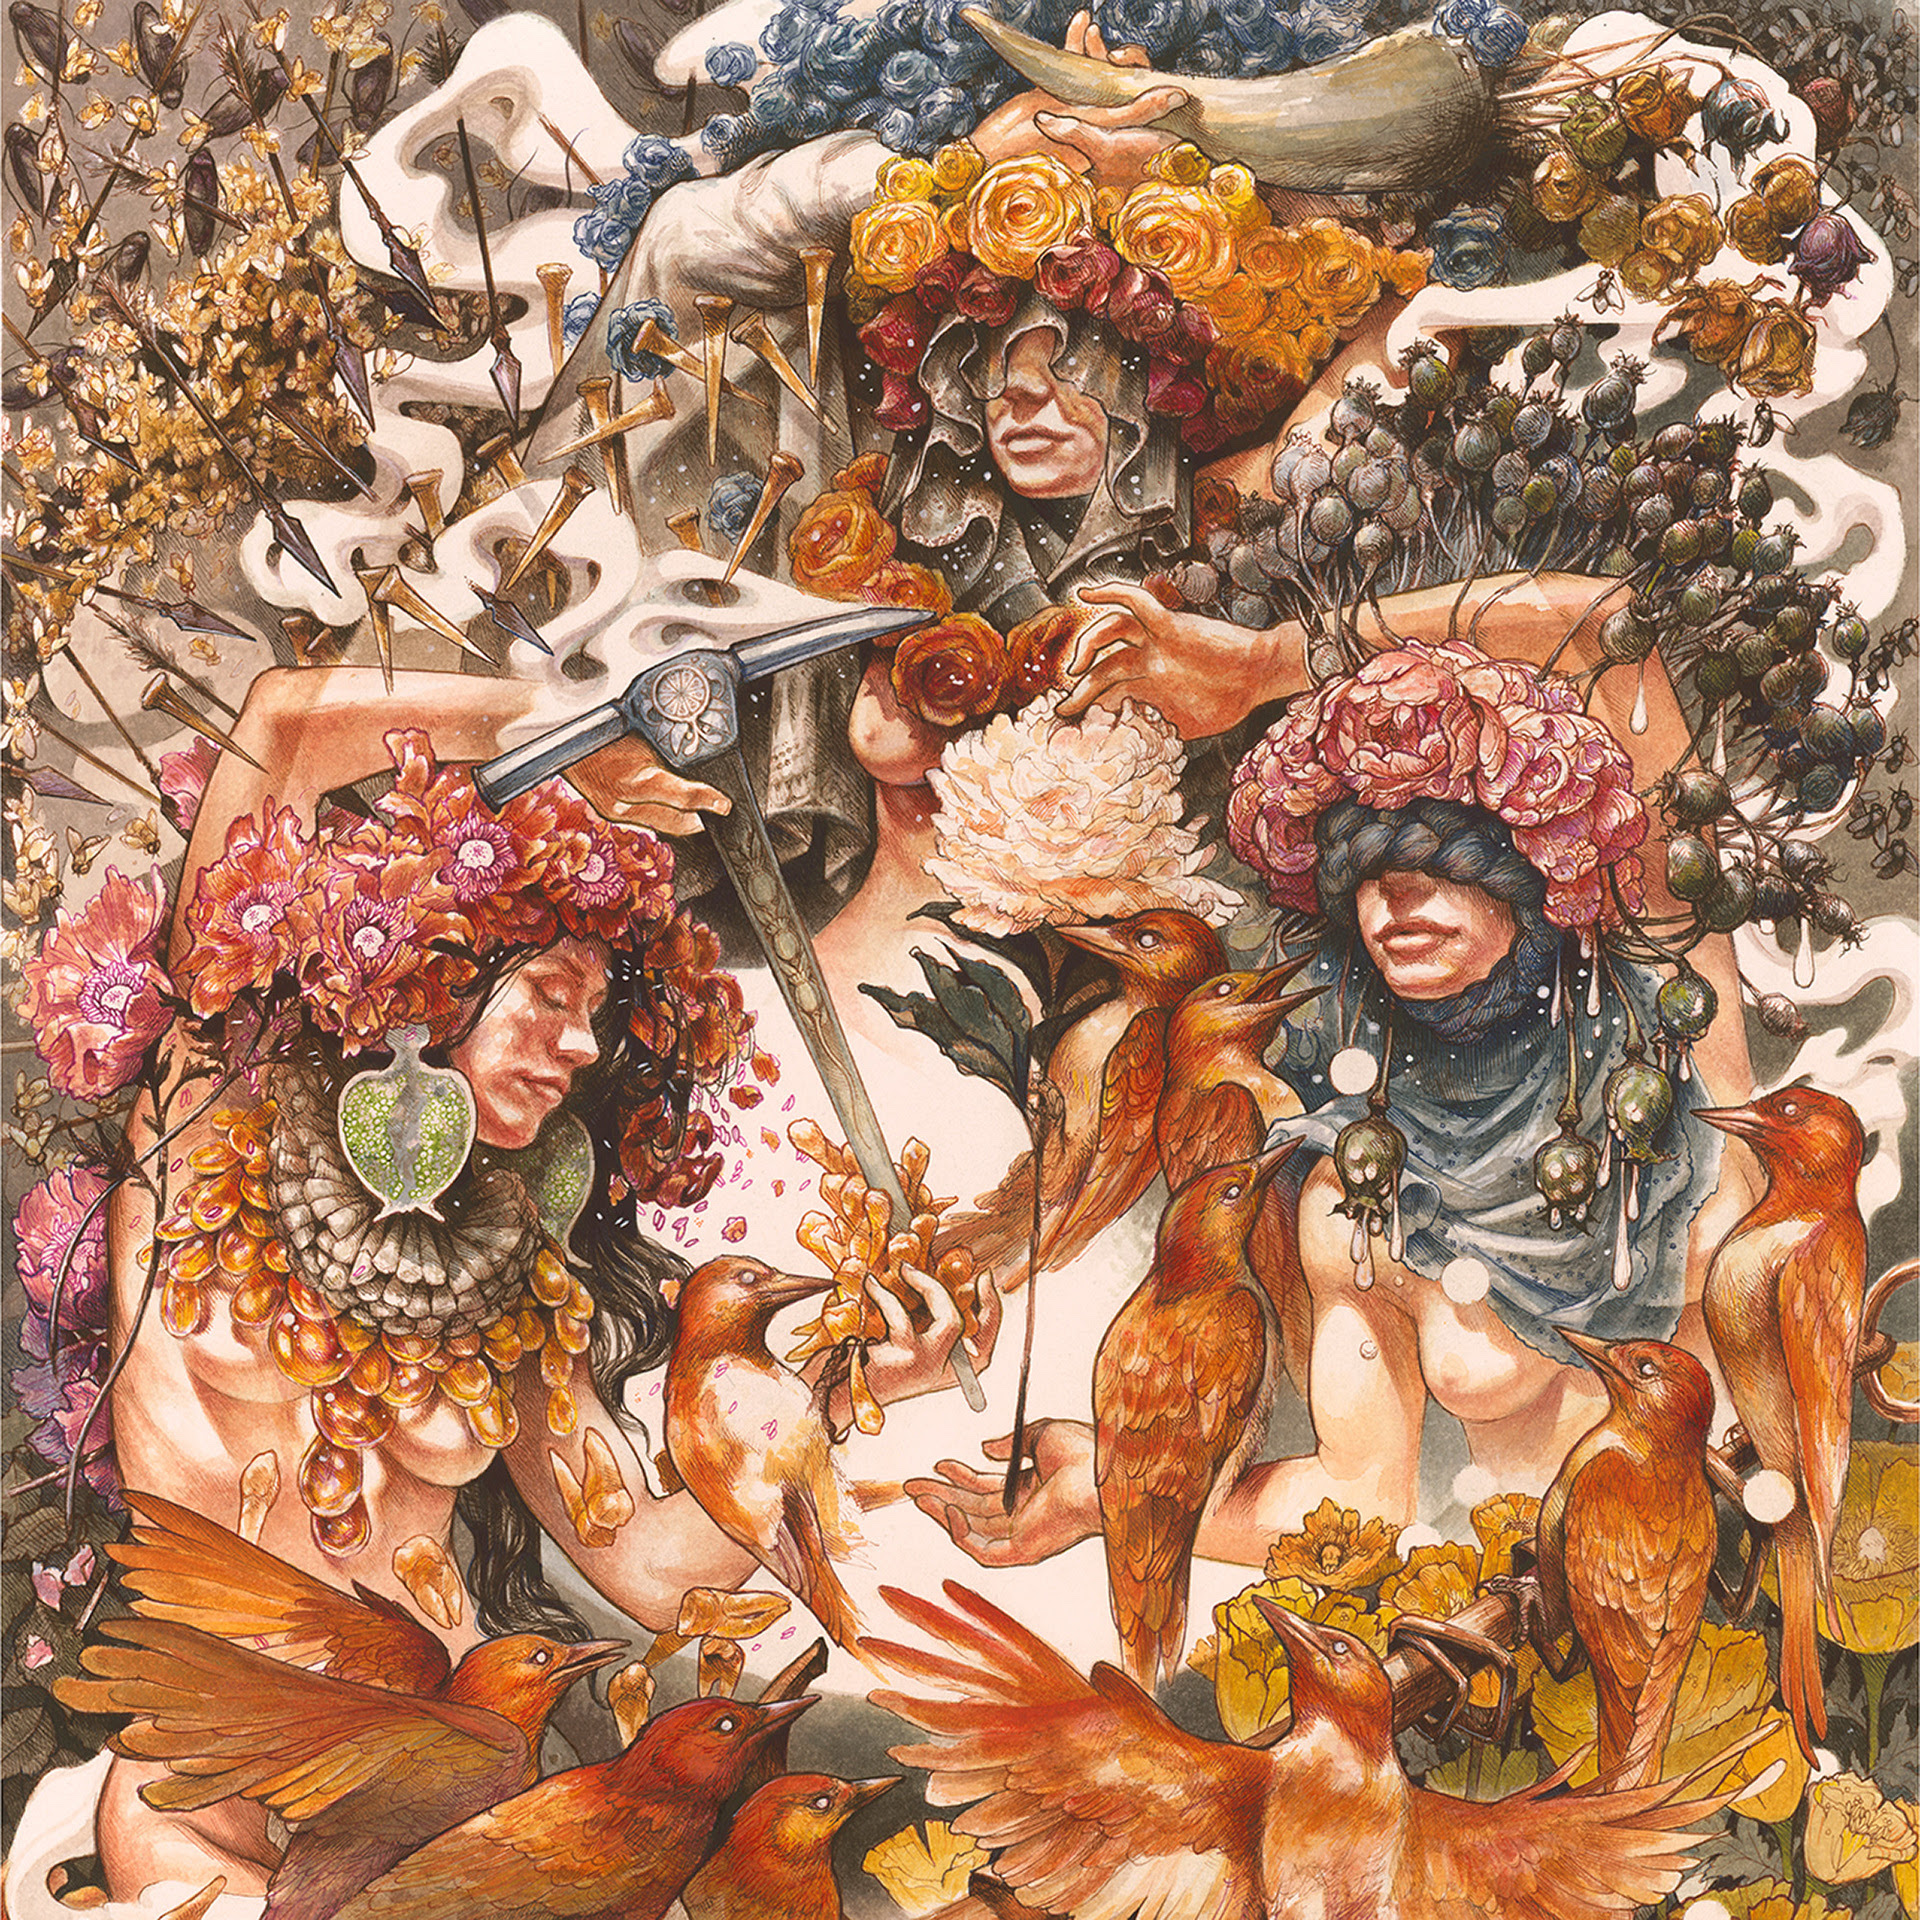 Baroness - Gold & Grey Album Cover